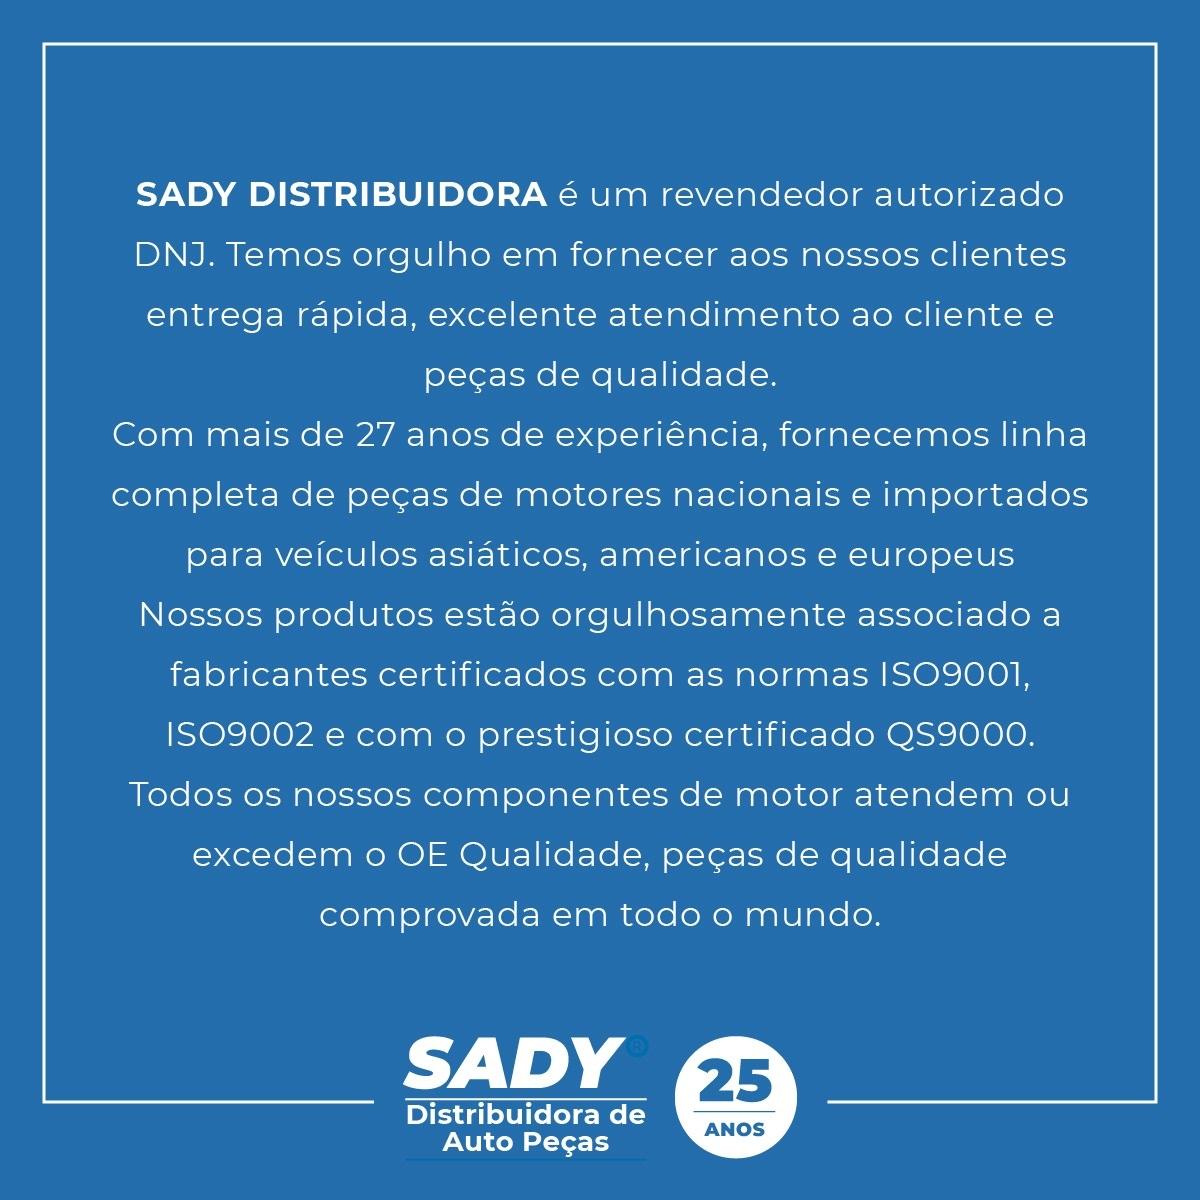 BOMBA DE OLEO DO MOTOR MERCEDES 2.4D MB 180